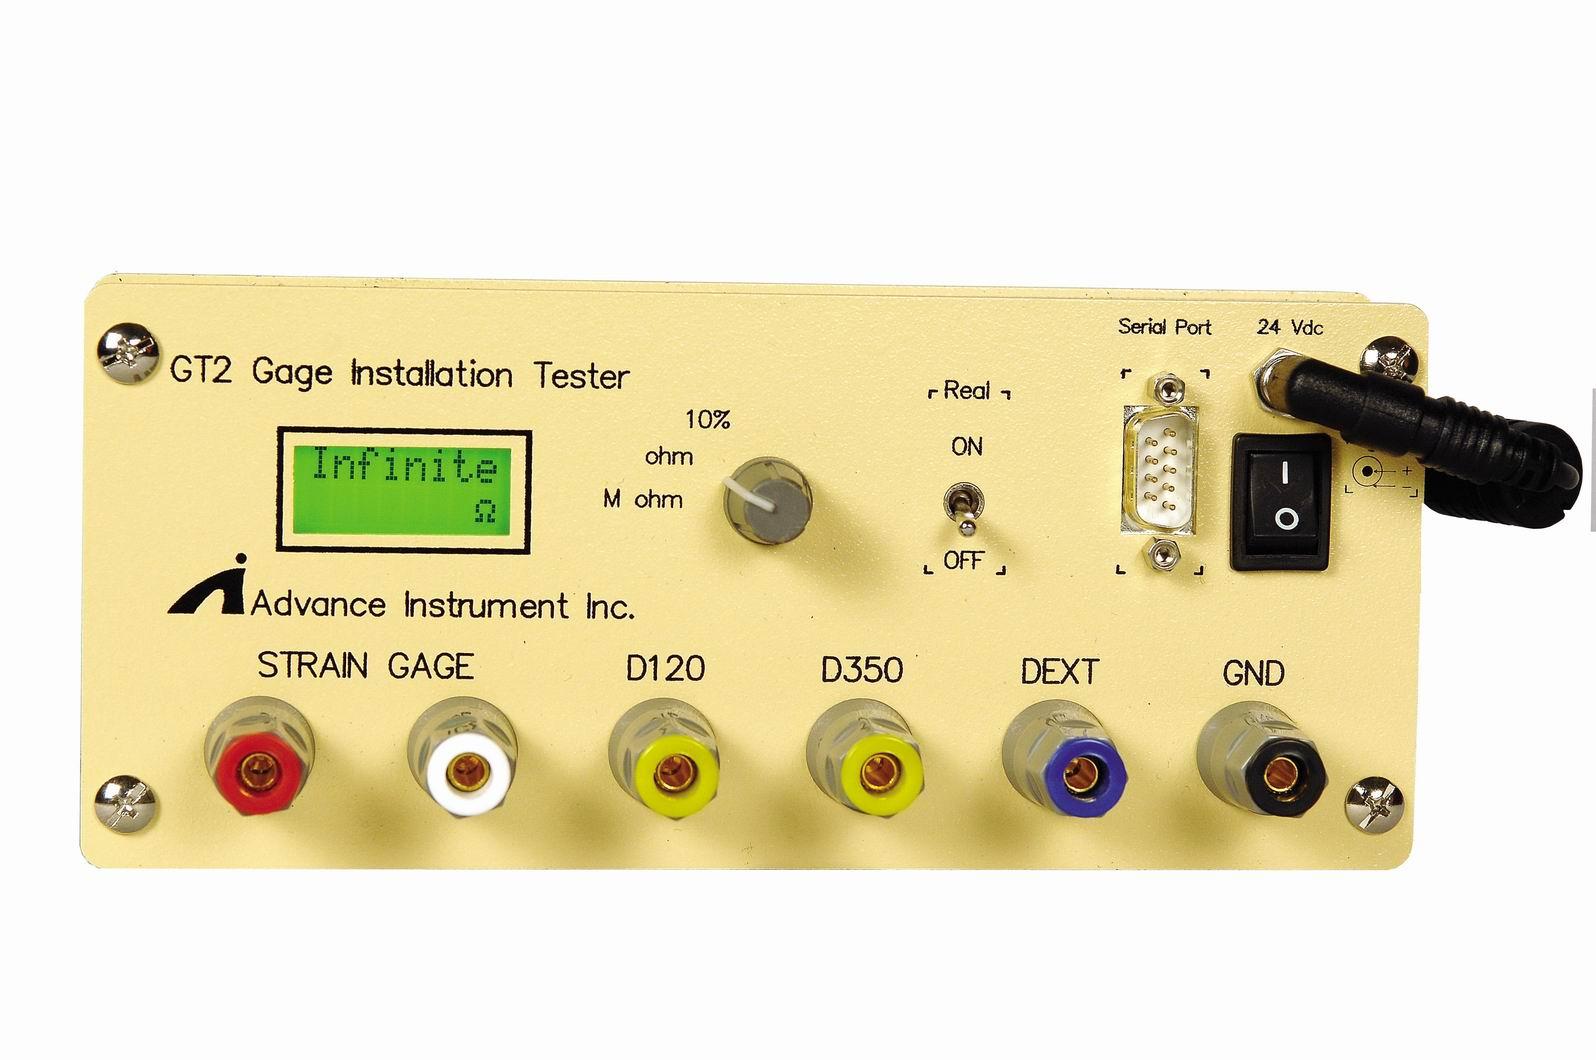 GT2 Gage Installation Tester